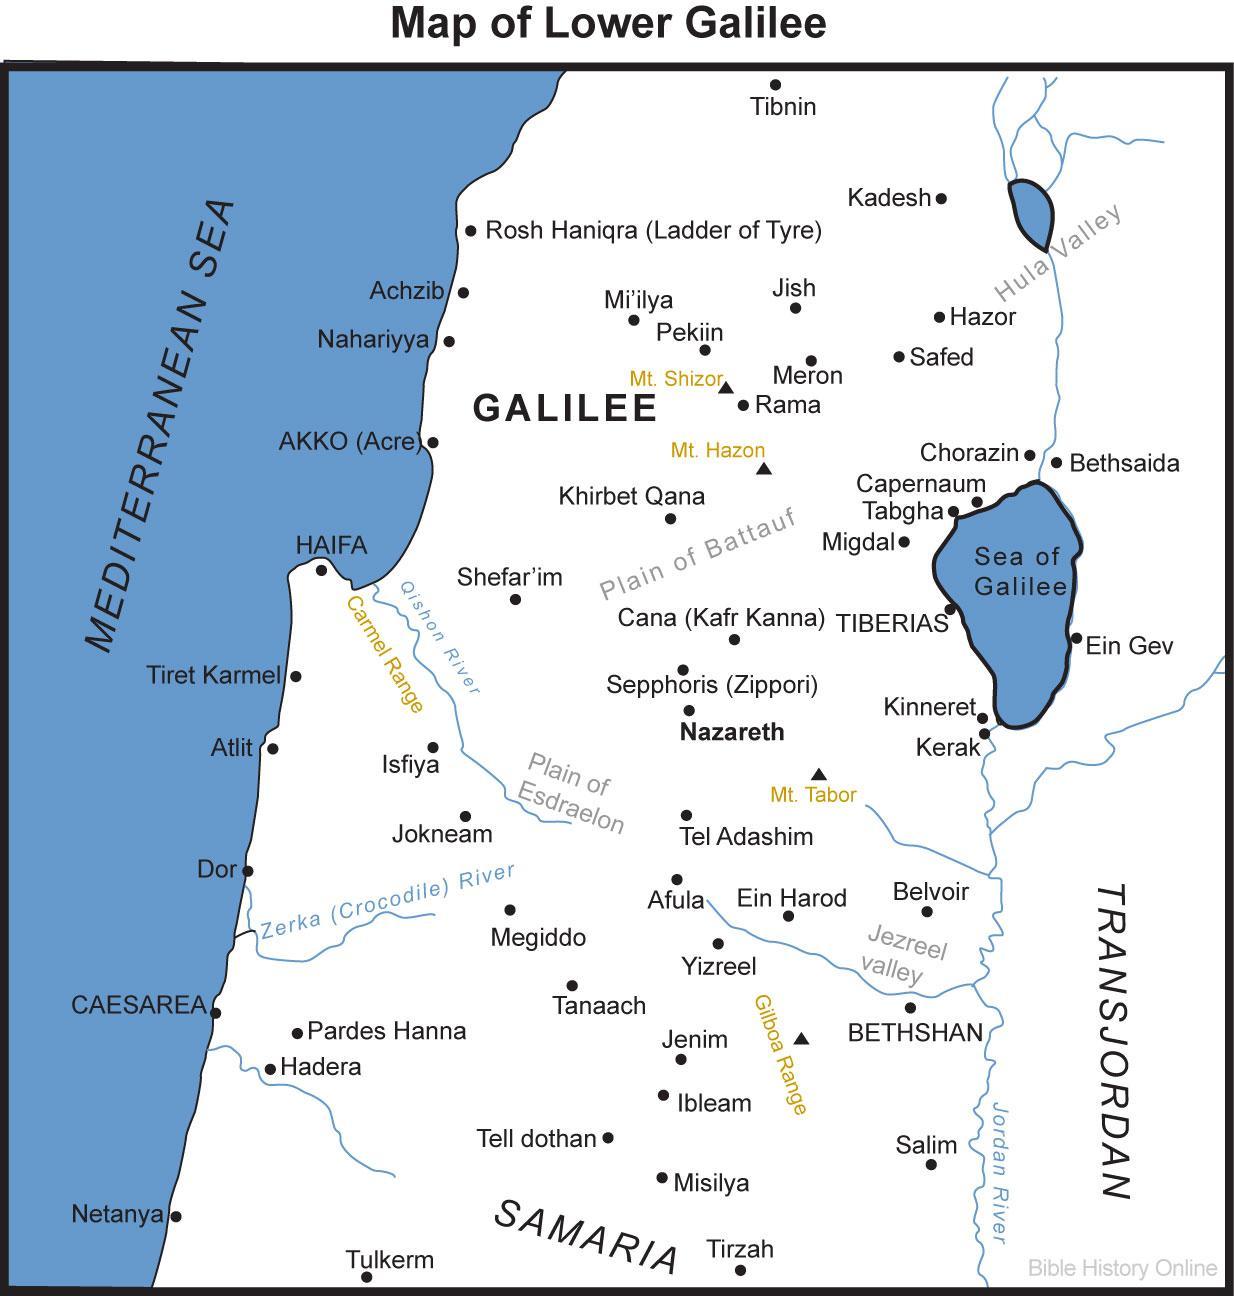 Jerusalem to Galilee map - Map of Galilee and Jerusalem (Israel) on judea map, mount of beatitudes, red sea, tyre map, bethsaida map, masada map, jezreel valley map, canaan map, rheinhessen map, jerusalem map, mount of olives, world map, syria map, gaza map, jordan river, gaza strip, haifa map, capernaum map, jordan river map, quonset map, nazareth map, dead sea map, negev map, rome map, church of the holy sepulchre, tel aviv, west bank, dead sea, golan heights map,